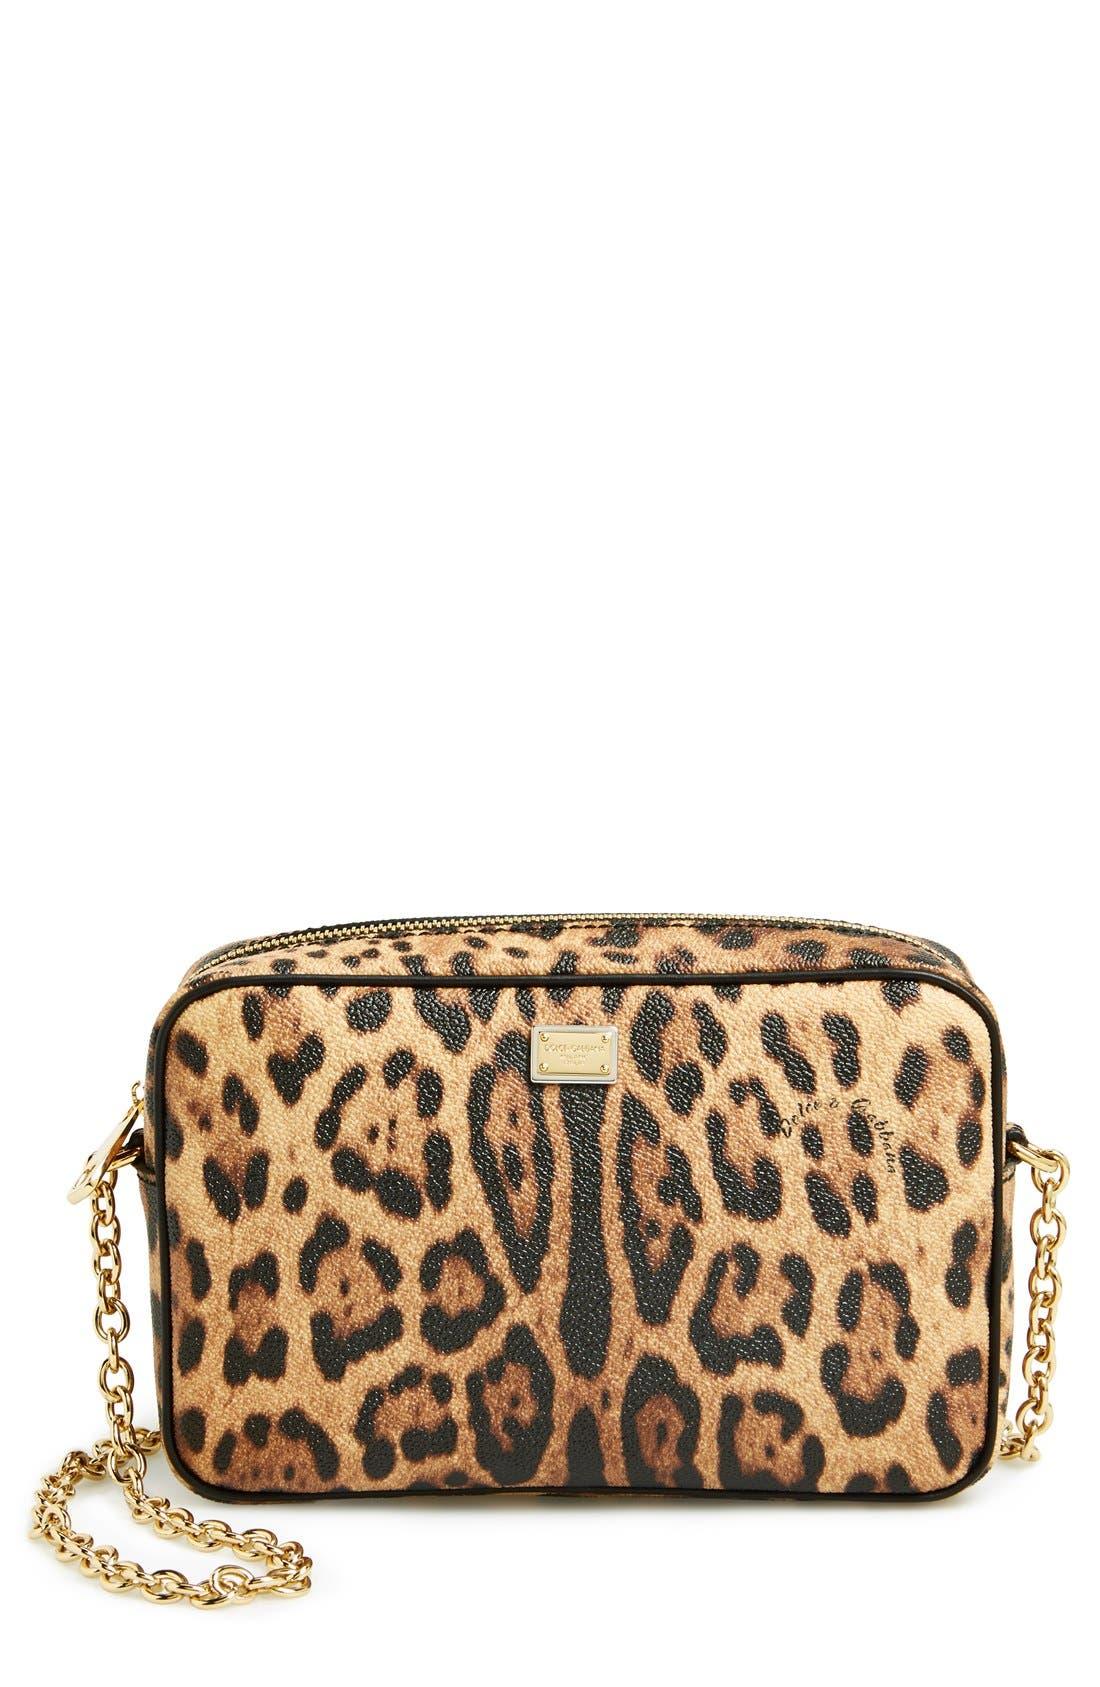 Main Image - Dolce&Gabbana 'Miss Cleo - Box' Crossbody Bag